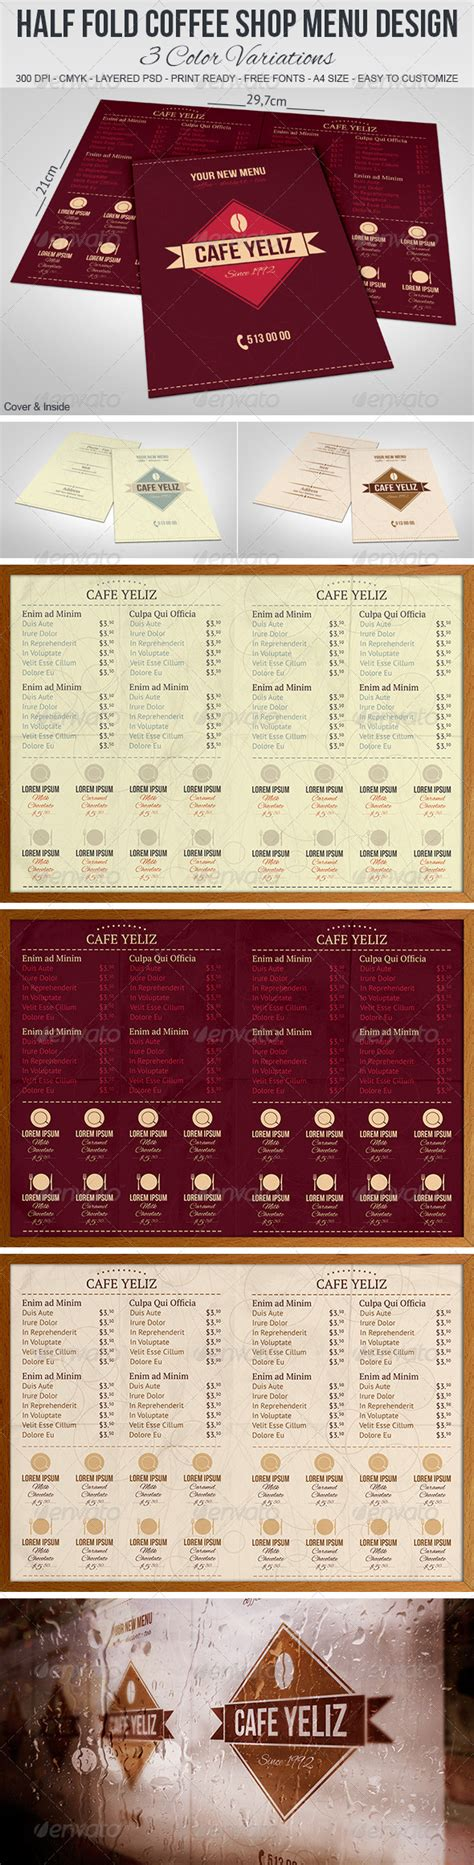 half fold menu template half fold coffee shop menu design graphicriver